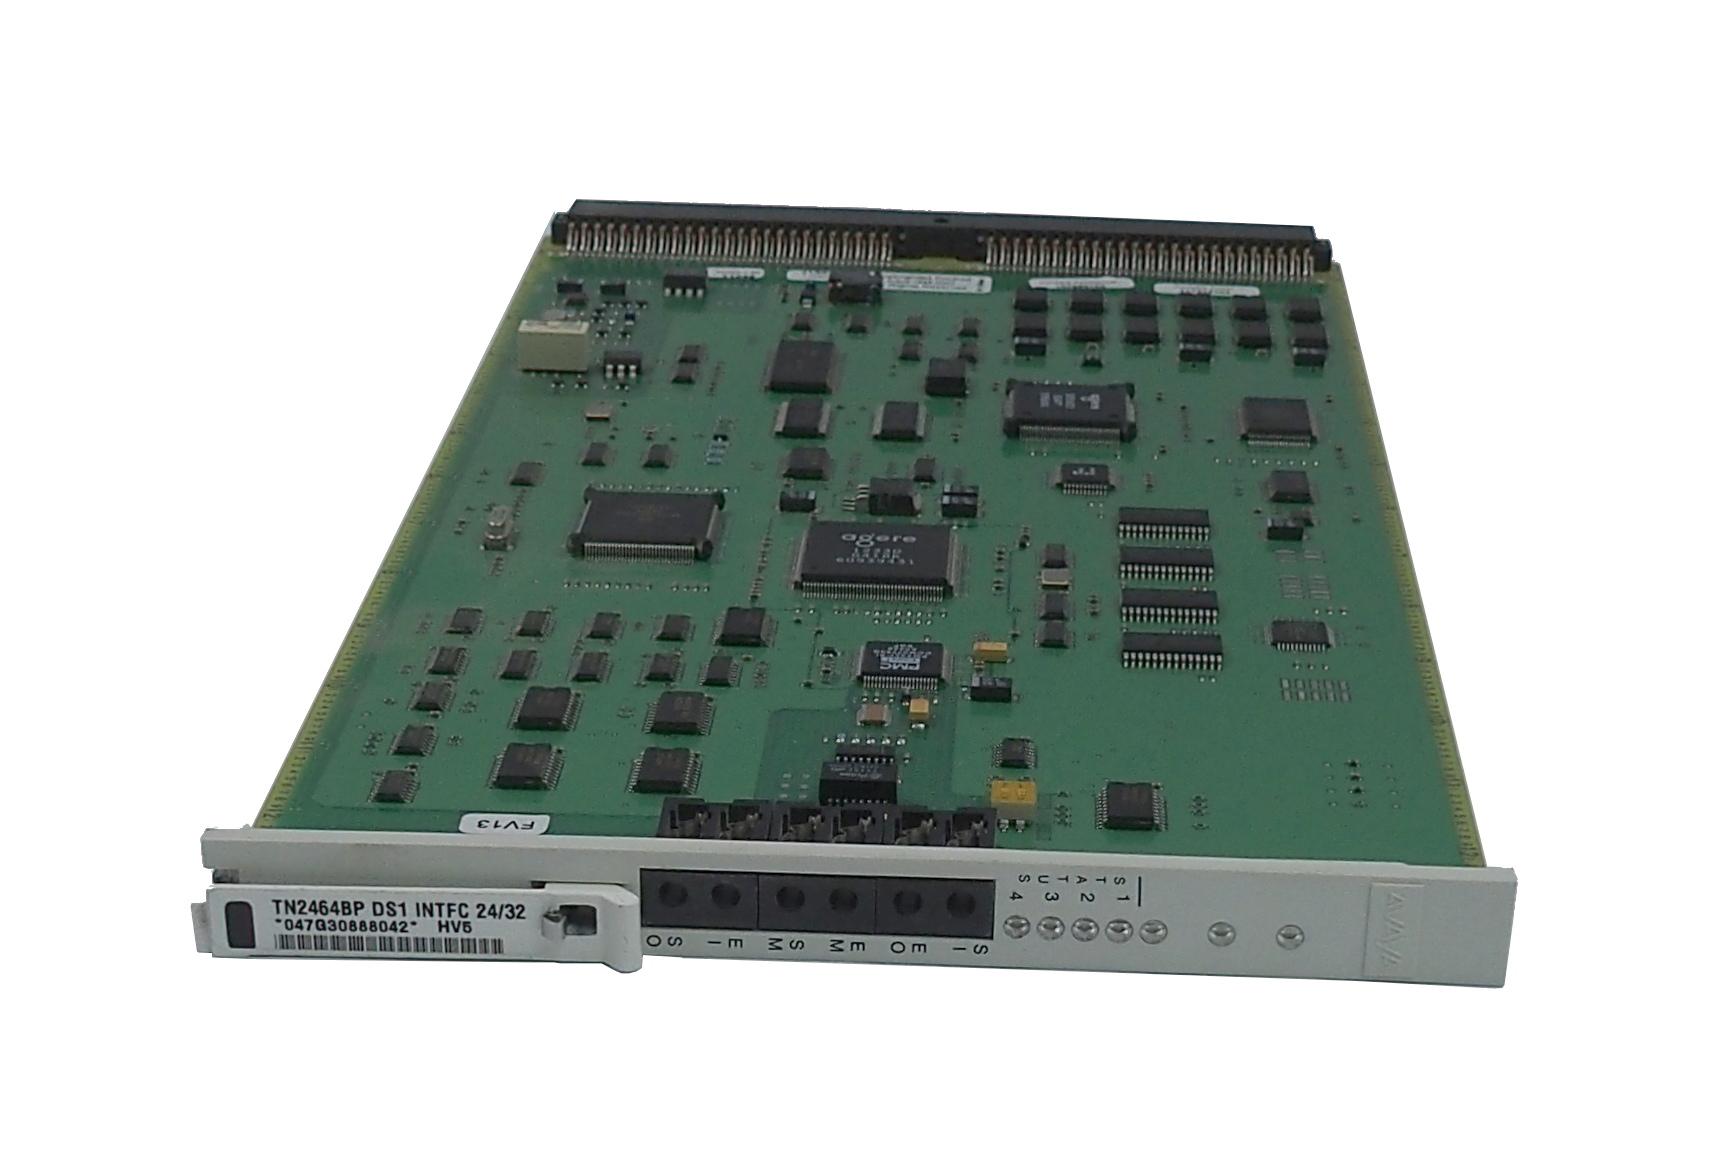 Avaya TN2464BP HV5 24/32 DS1 InterfaceCard